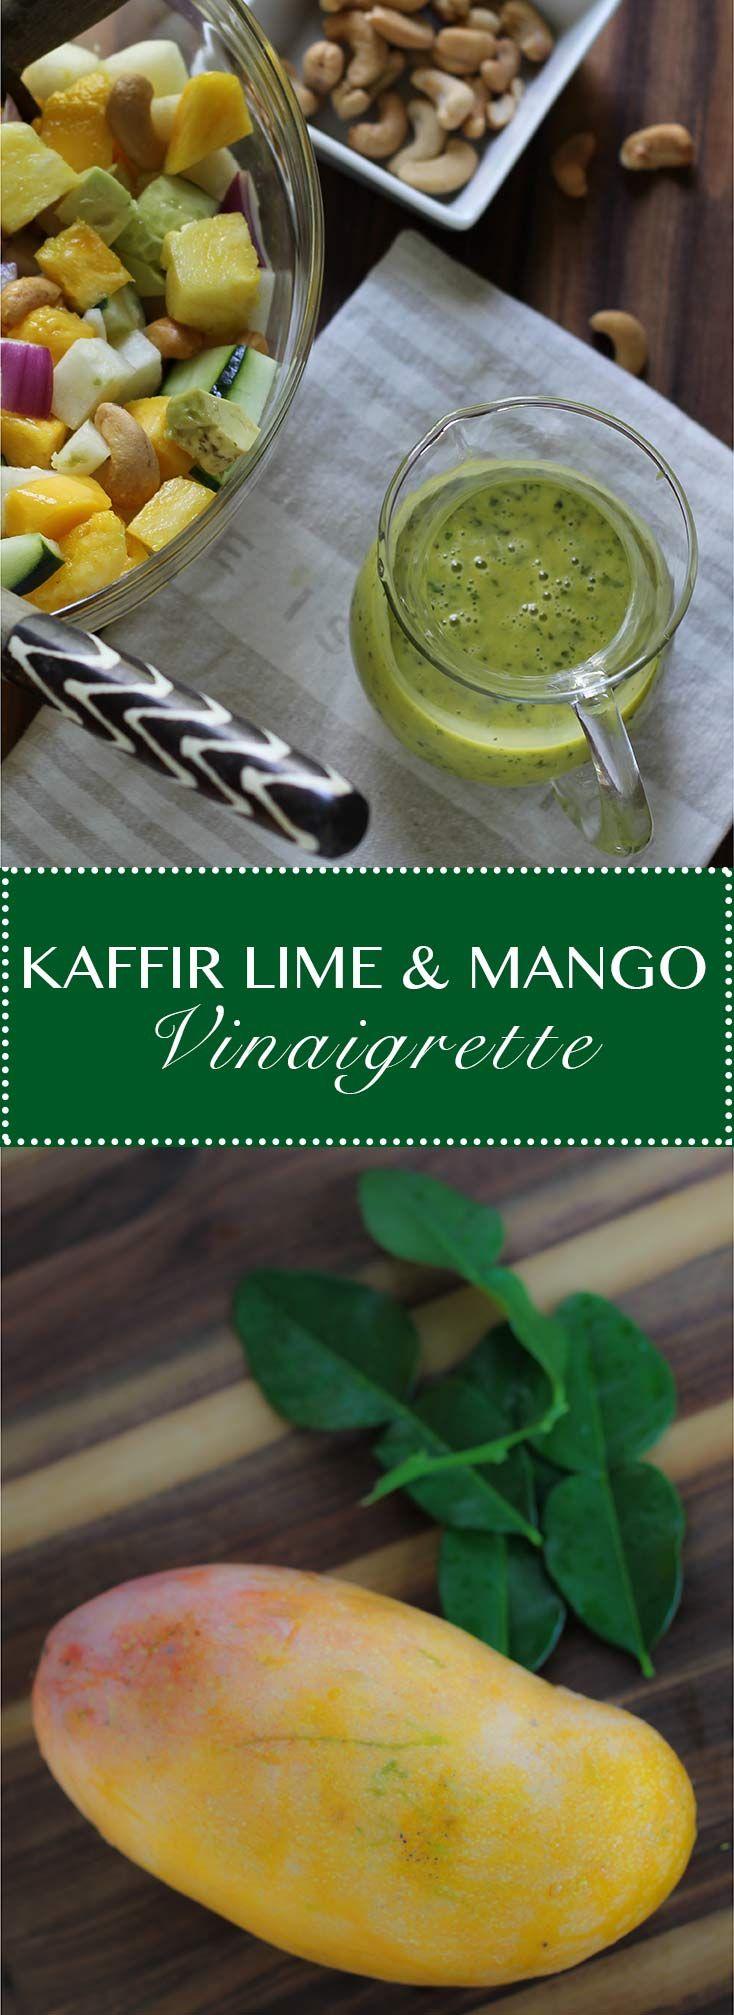 Kaffir Lime & Mango Vinaigrette.  Adds exotic lime flavor to tropical salads, noodle bowls and fresh rolls.